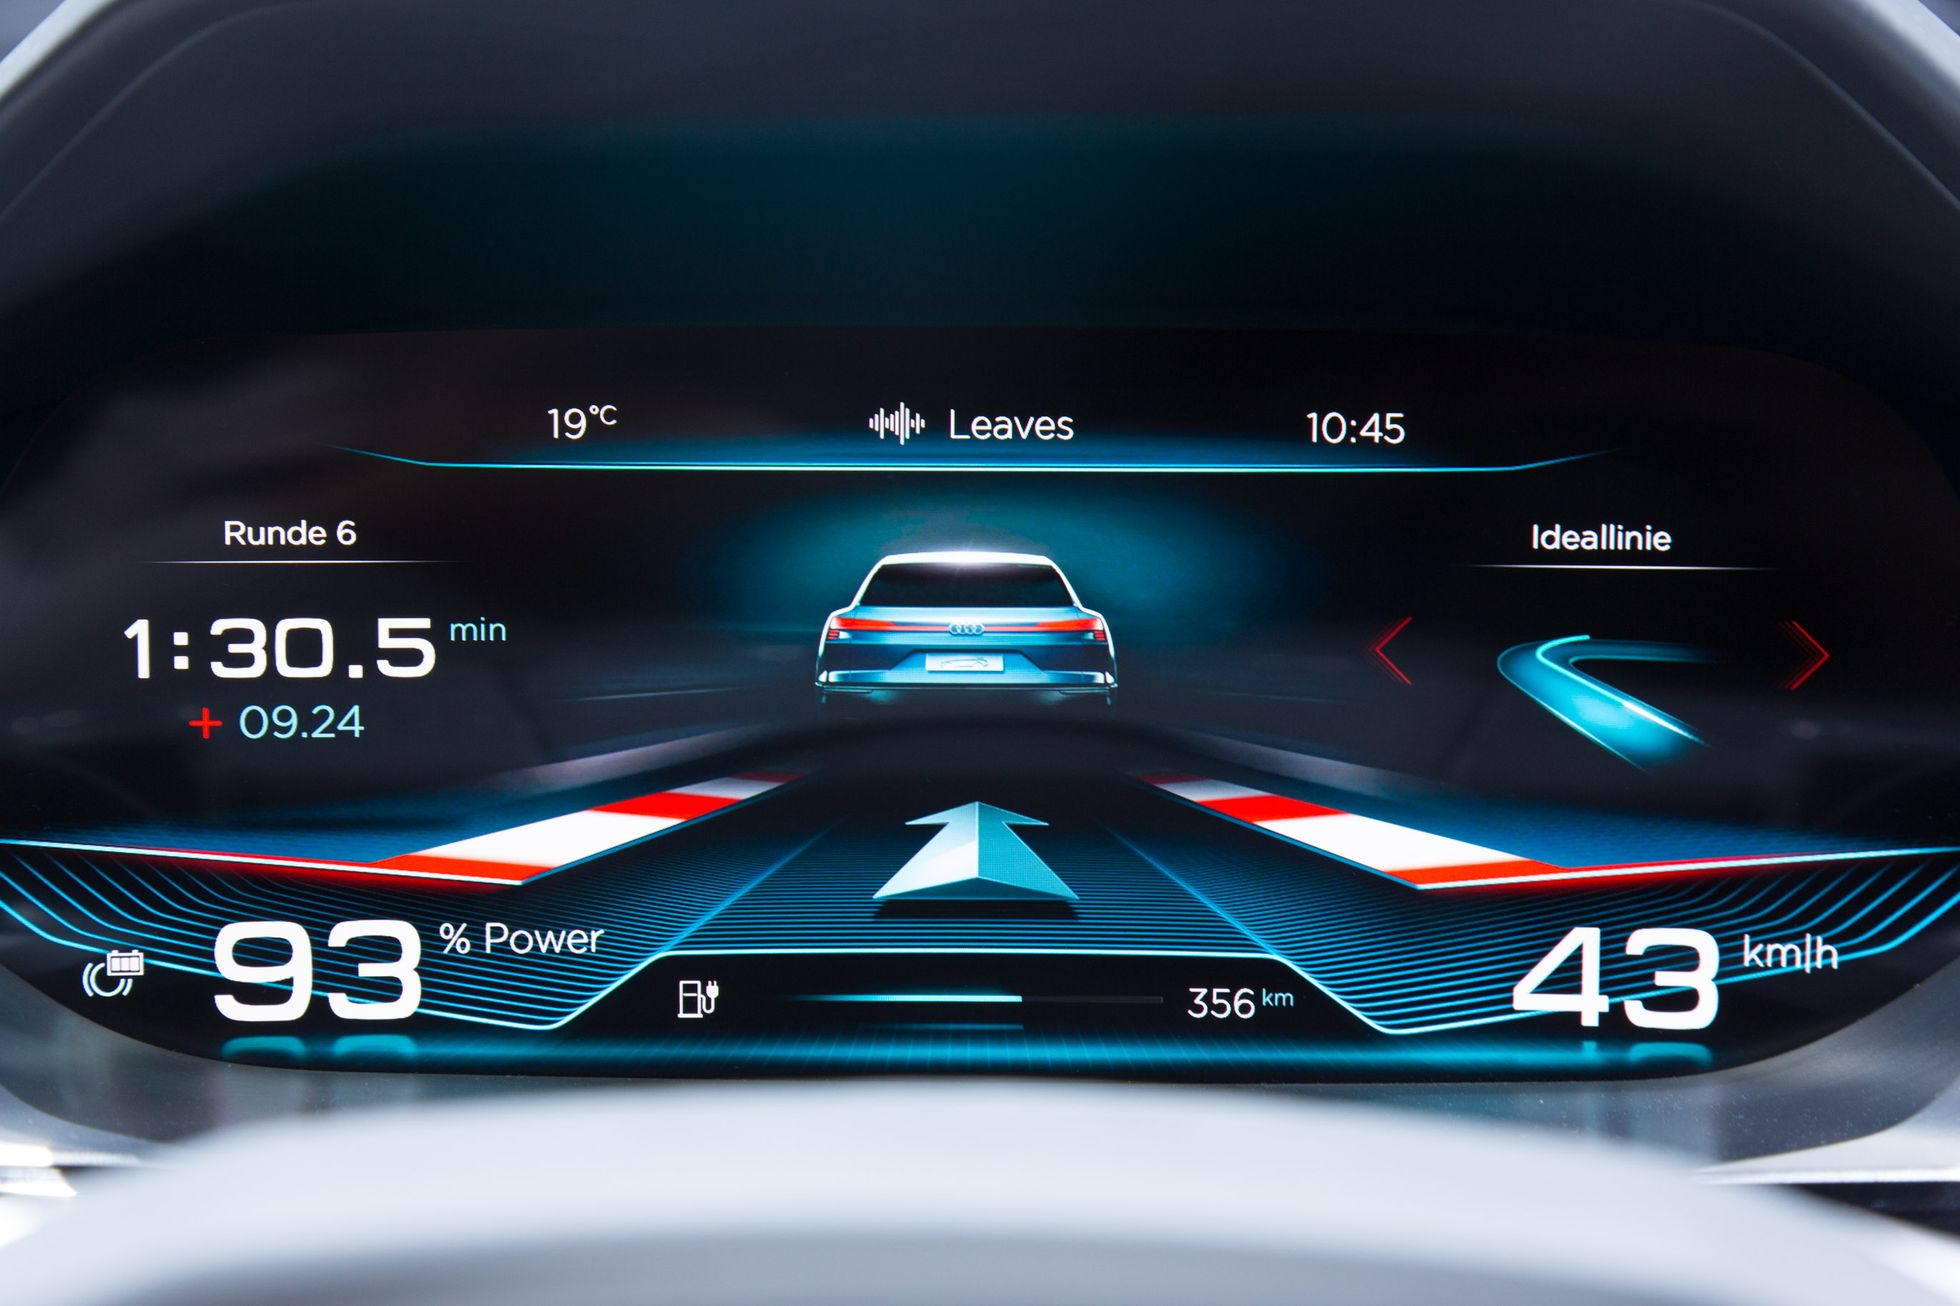 E-Tron Quattro Concept: Audi nennt Details zum neuen Virtual Cockpit - Es zeigt unter anderem auch den Ladestand des Akkus. (Foto: Martin Wolf/Golem.de)